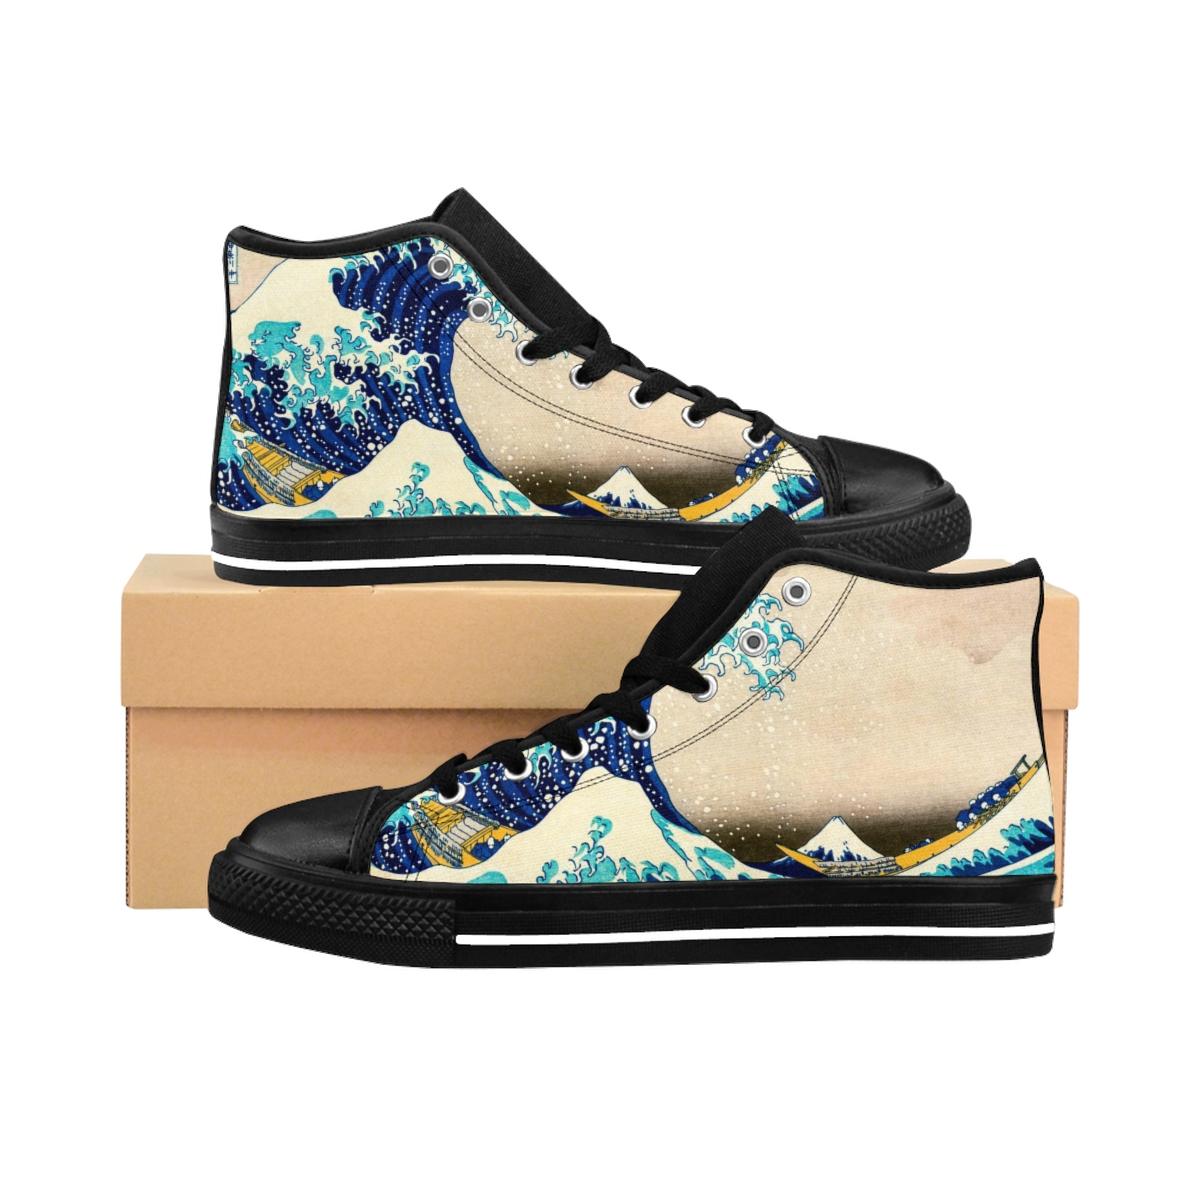 Sneaker, Die große Welle vor Kanagawa von Katsushika Hokusai, Japan